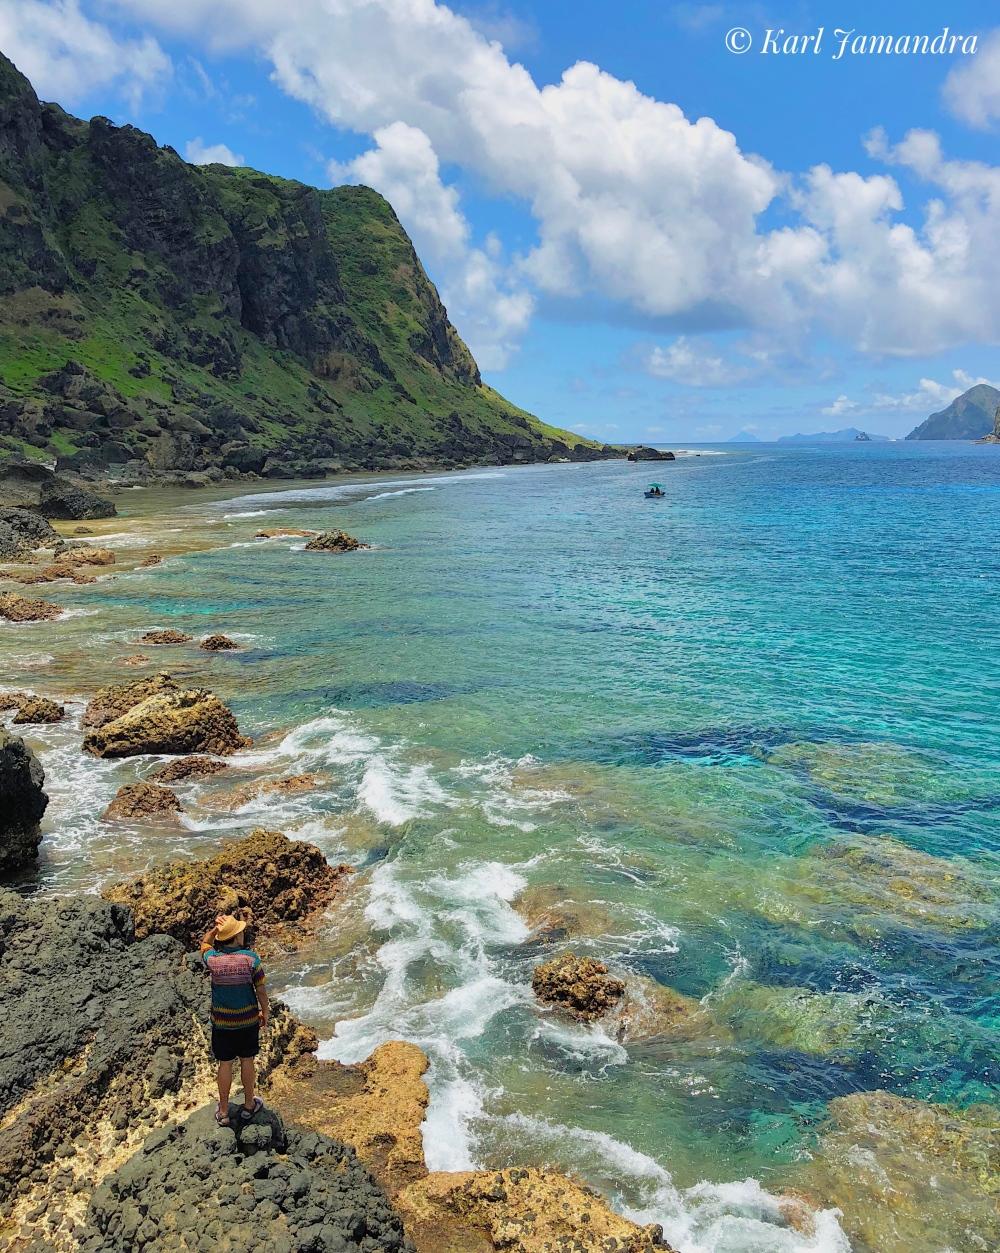 MAVULIS ISLAND'S C:EAR WATERS